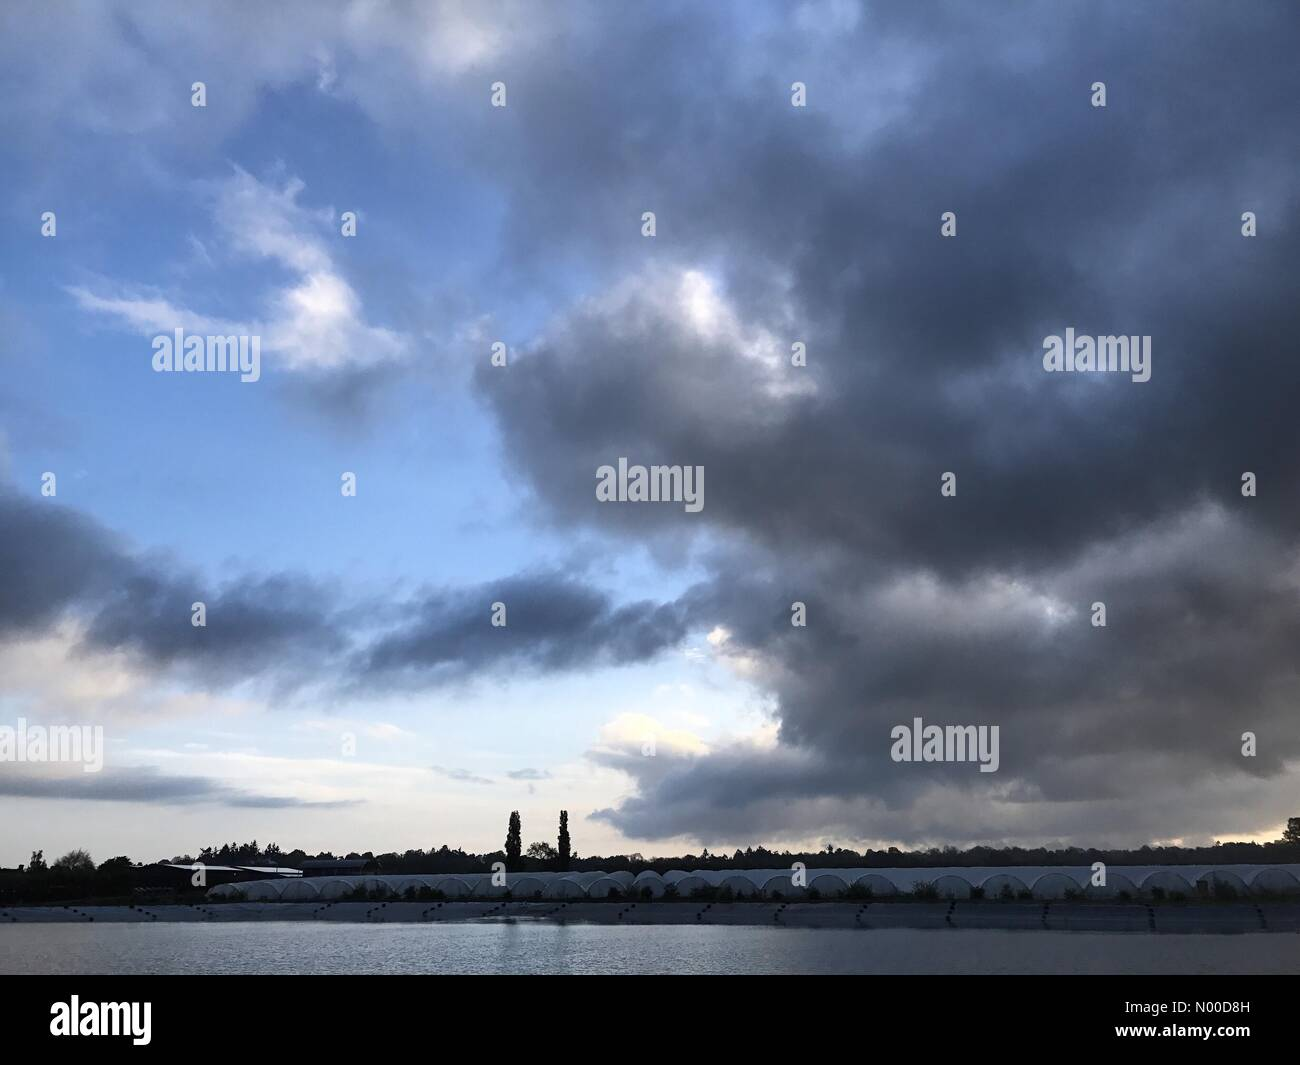 Tuesley Ln, Godalming, UK. 01st May, 2017. UK Weather: Sunrise over Godalming. Tuesley Ln, Godalming. 01st May 2017. - Stock Image